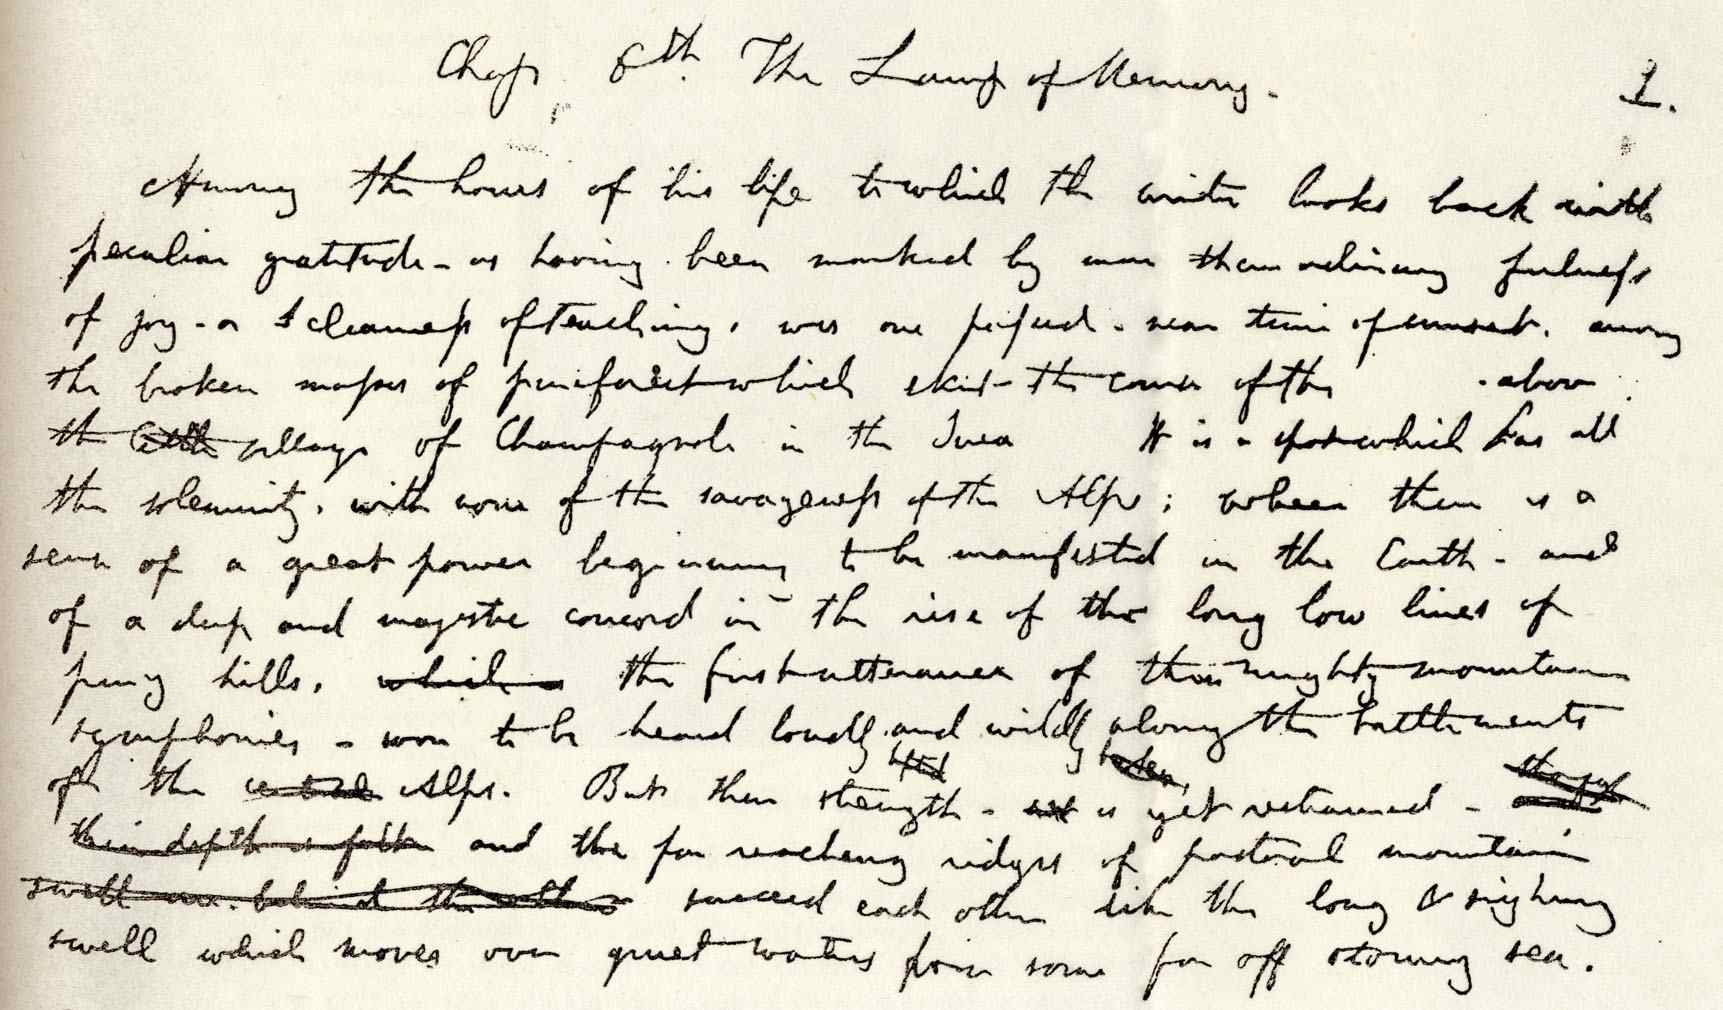 Hand written opening chapter of John Ruskin's The Lamp of Memory